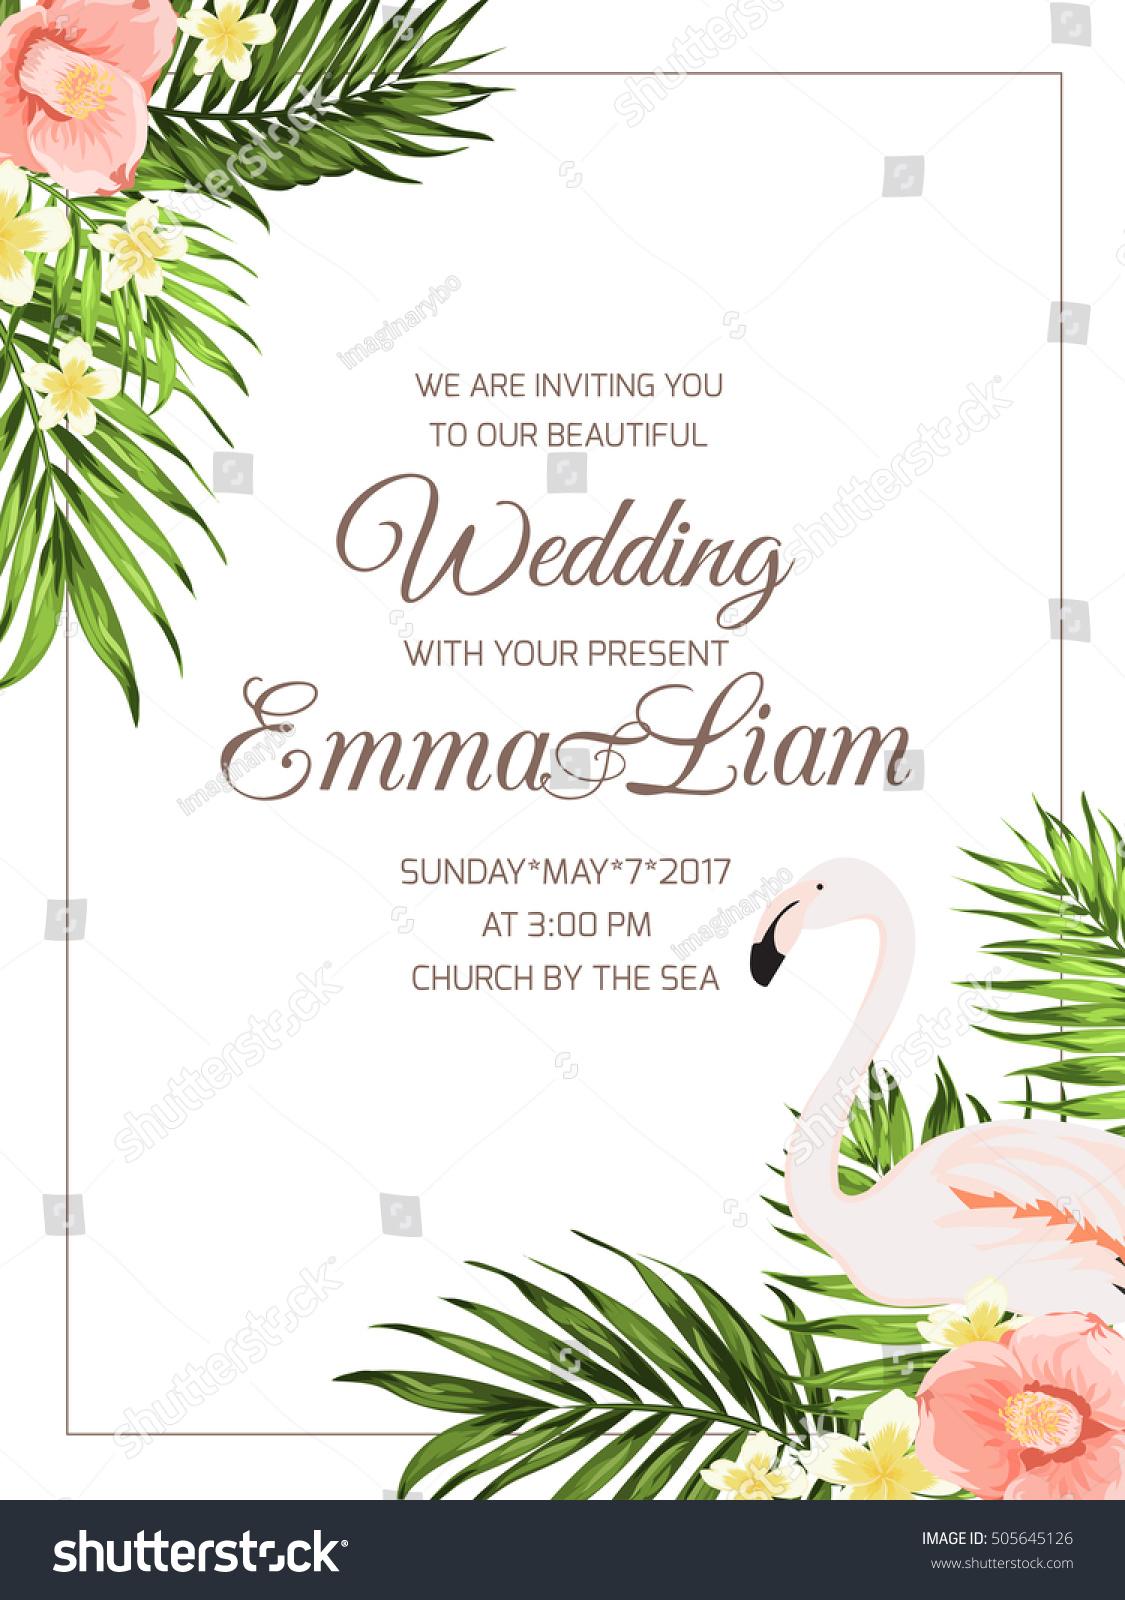 wedding ceremony invitation template text placeholder のベクター